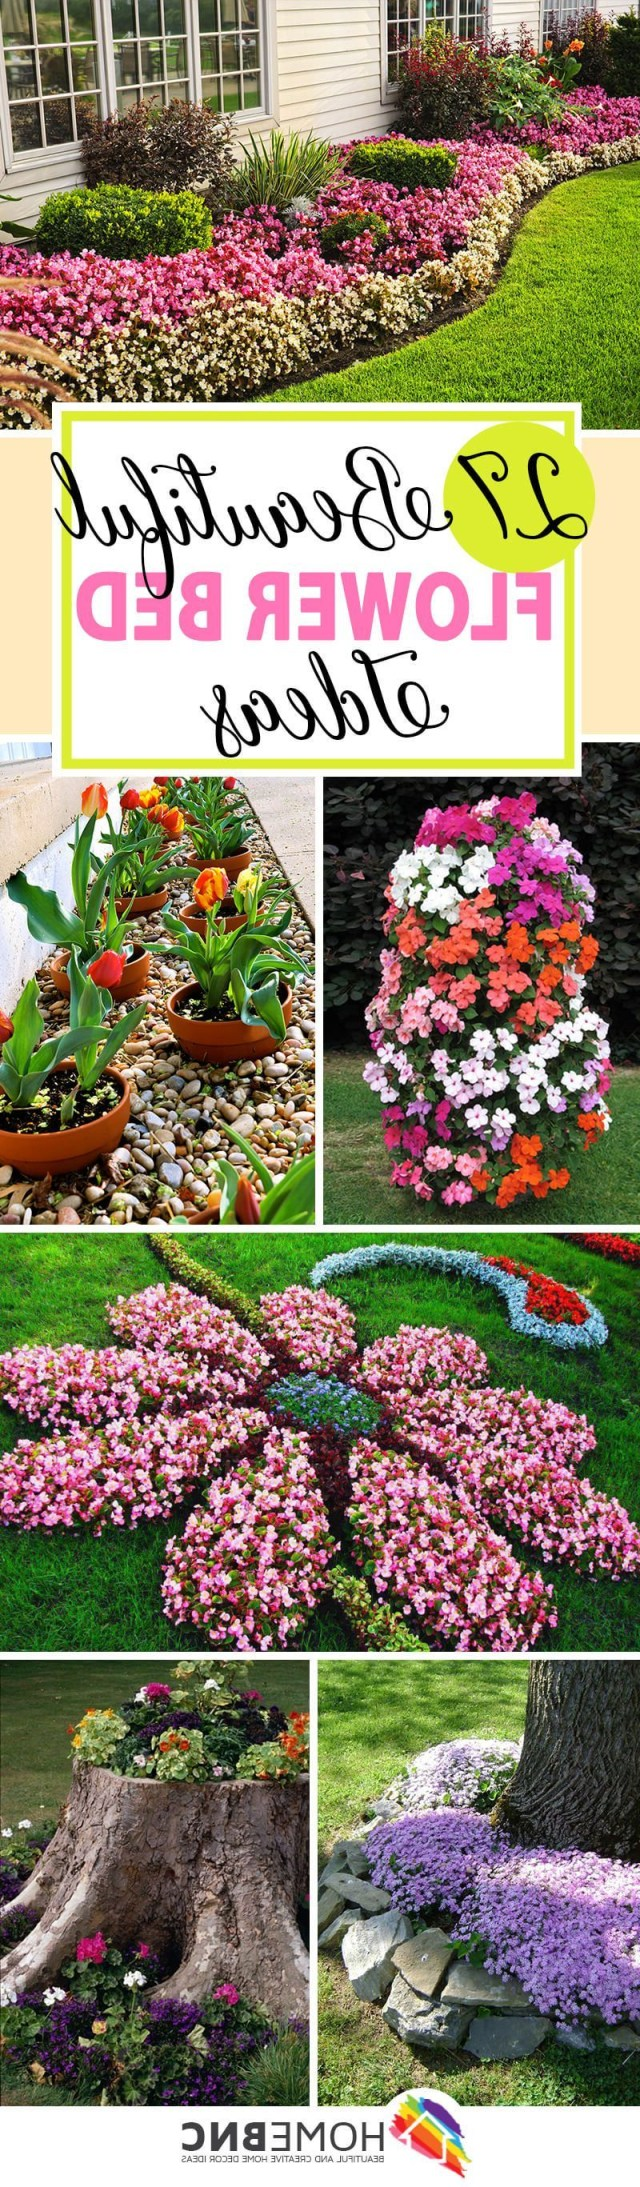 10 Unique Flower Garden Ideas Most Brilliant And